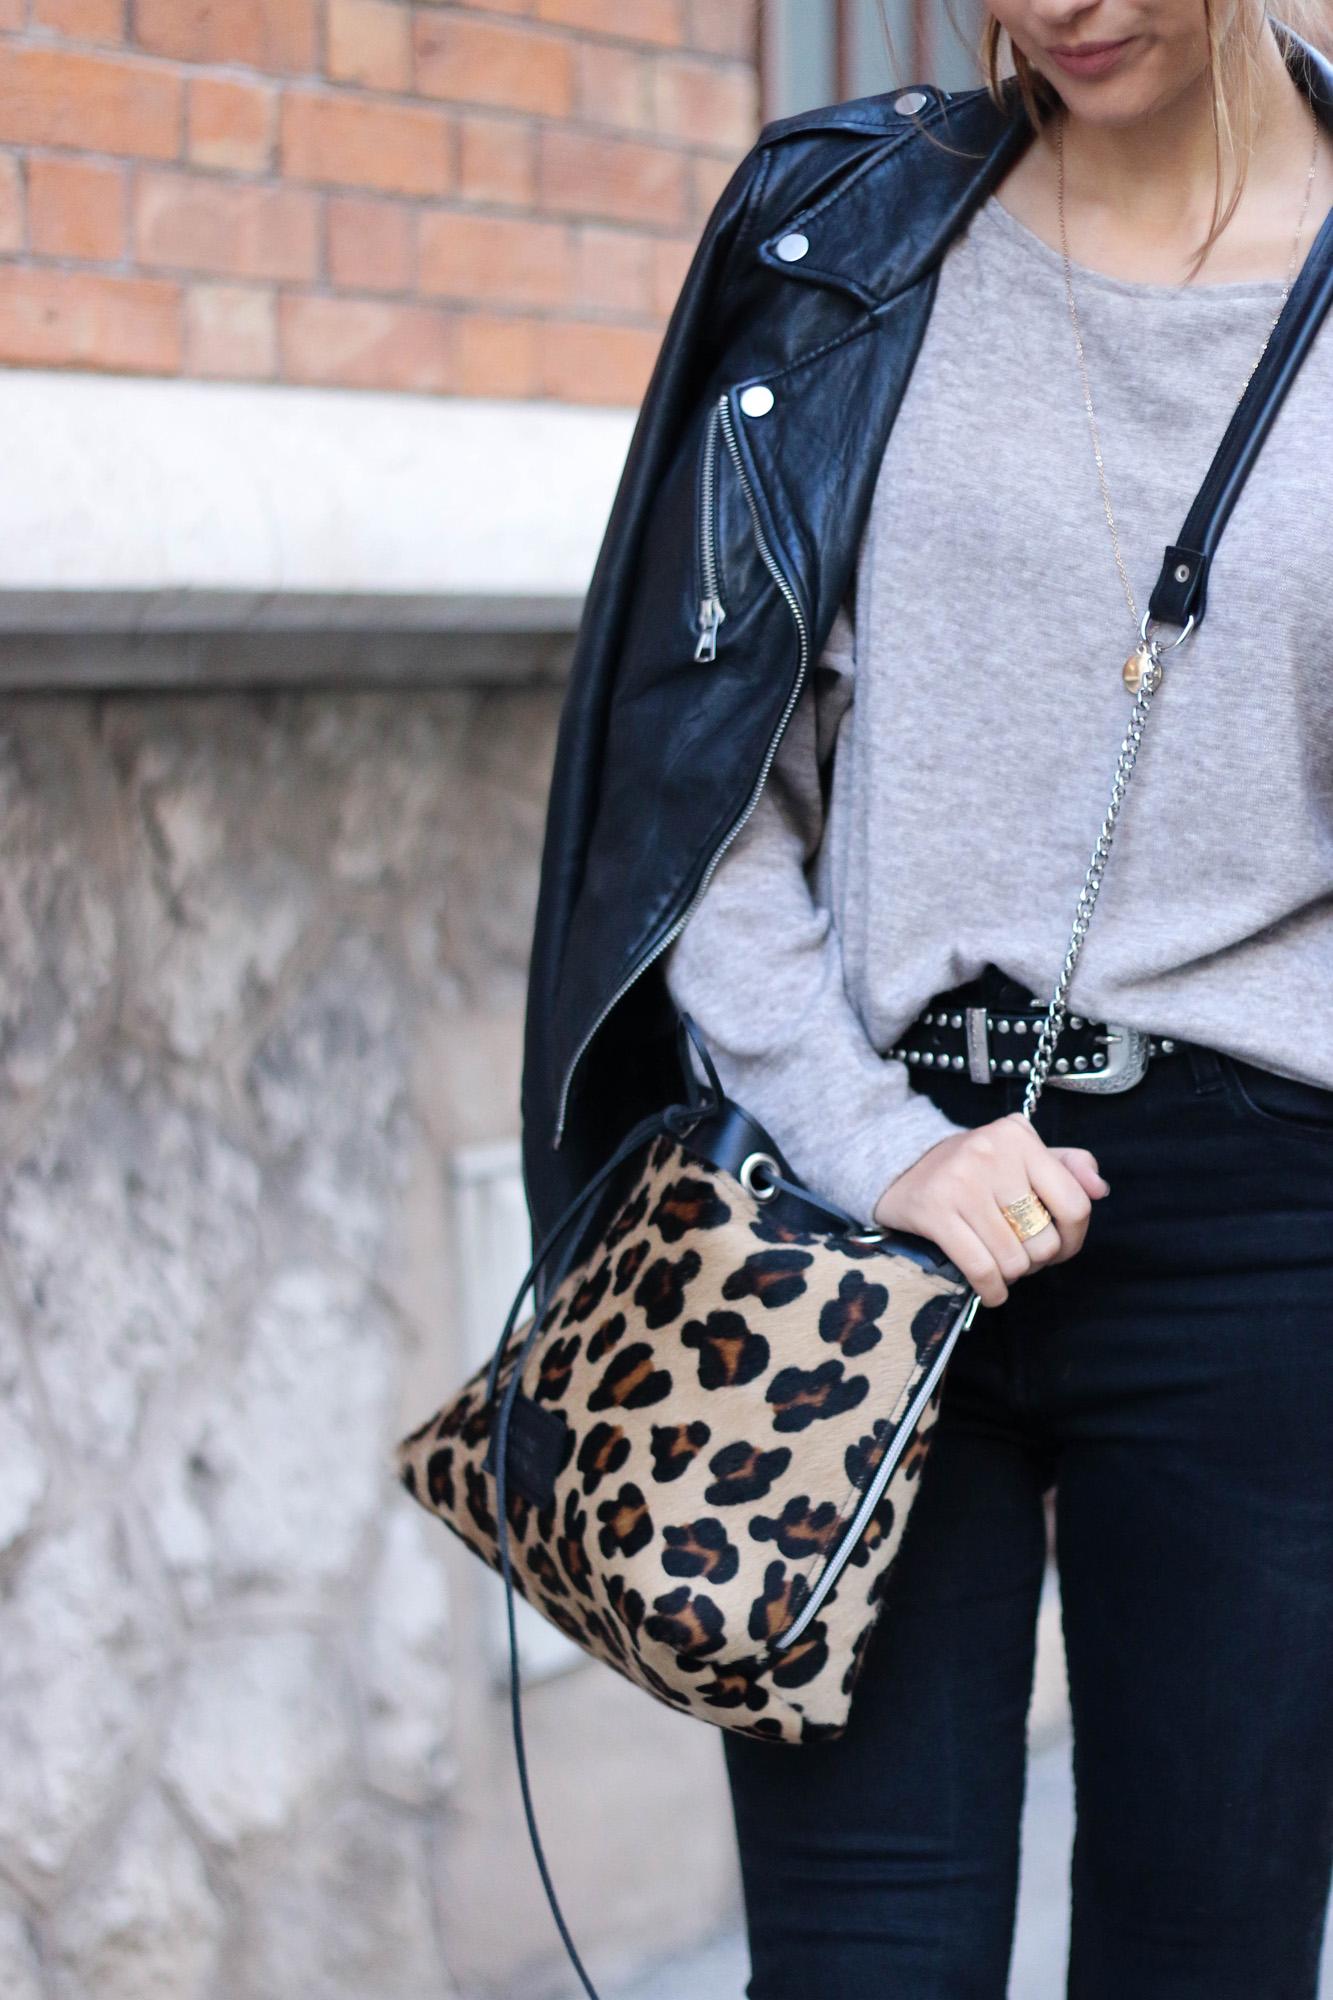 blog-mode-sac-leopard-celine-schener